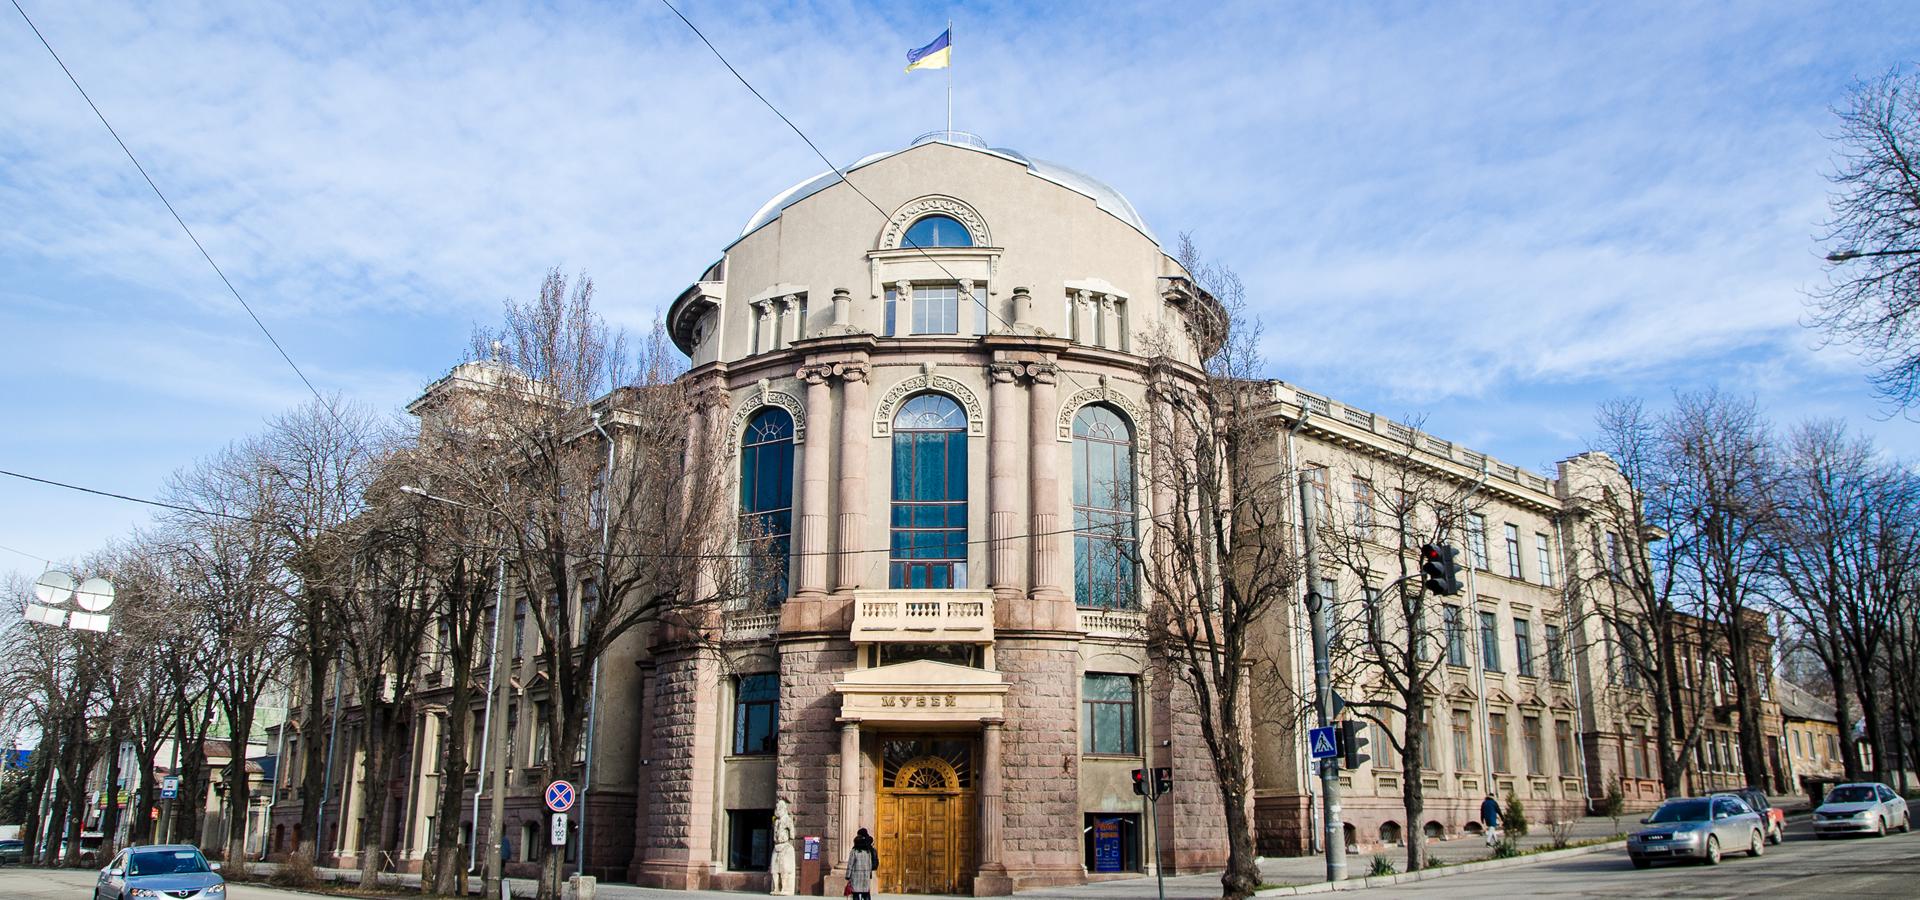 Peer-to-peer advisory in Melitopol, Zaporizhzhya Oblast, Ukraine